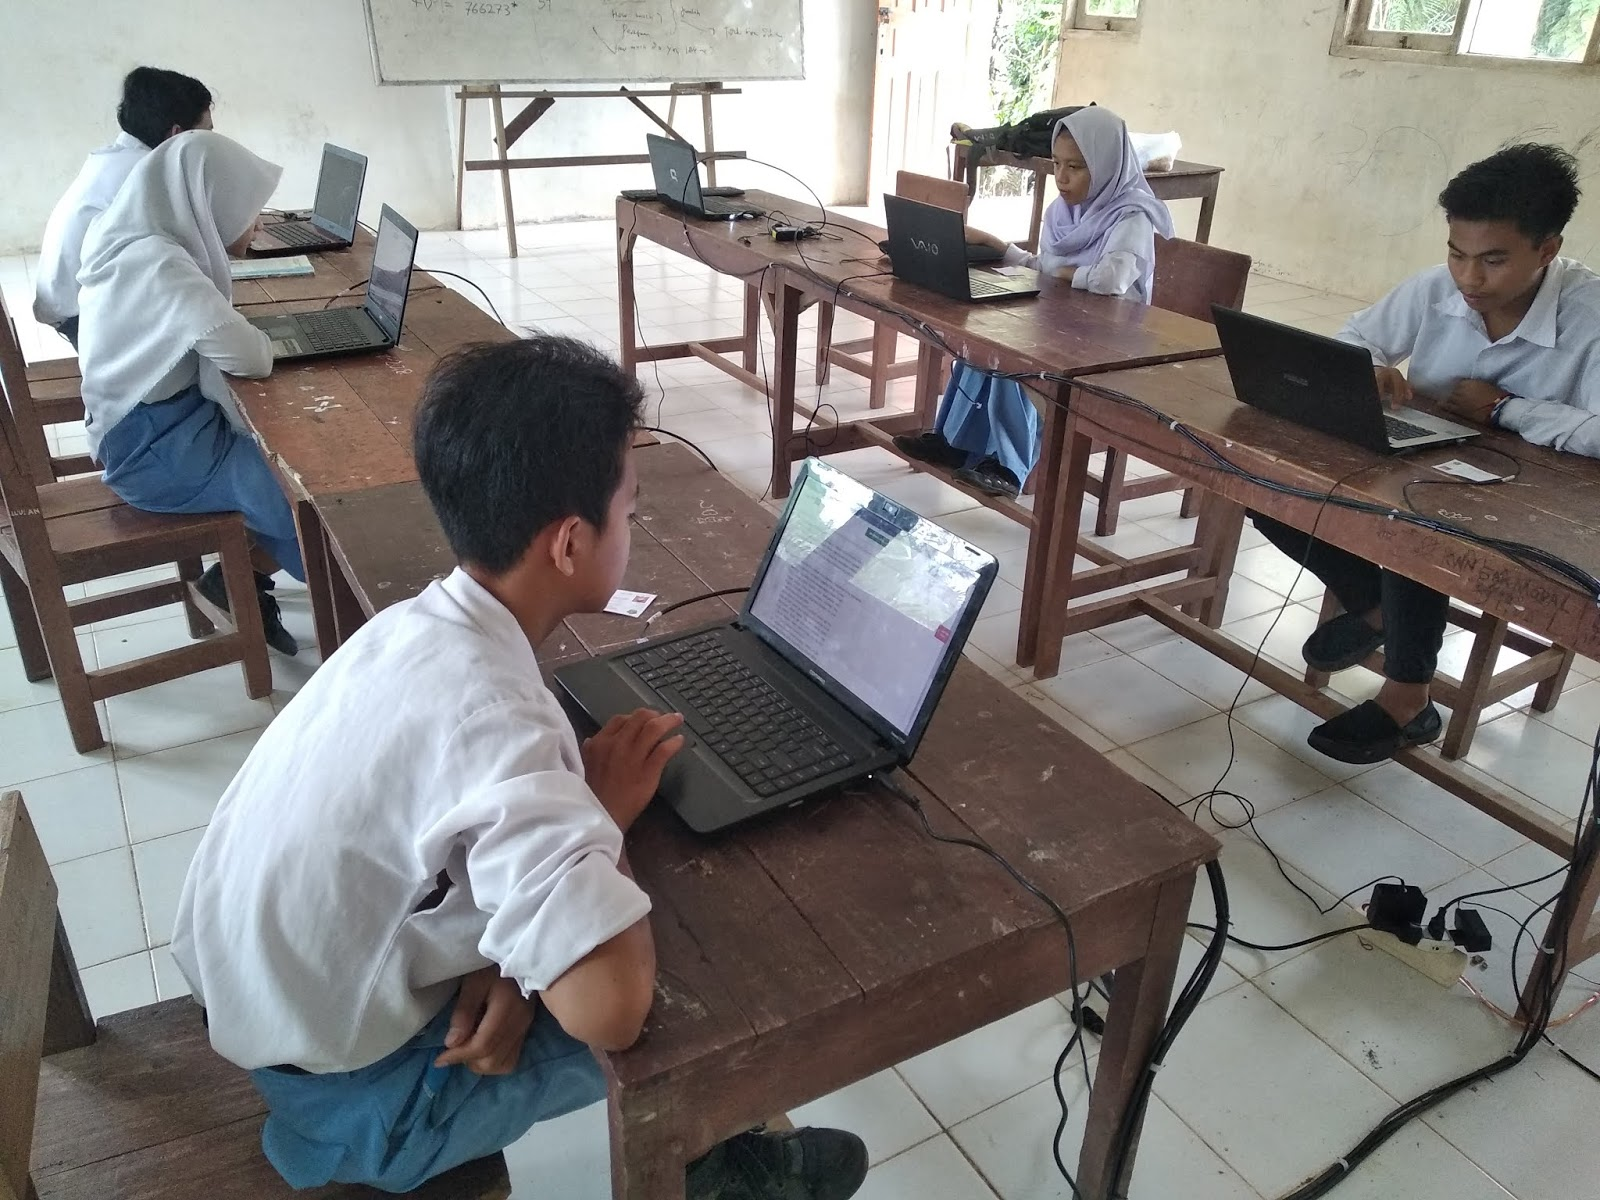 Kelas 9 MTs Nurul Huda Tandun Ikuti Simulasi UNBK Periode 2 Tahun 2019